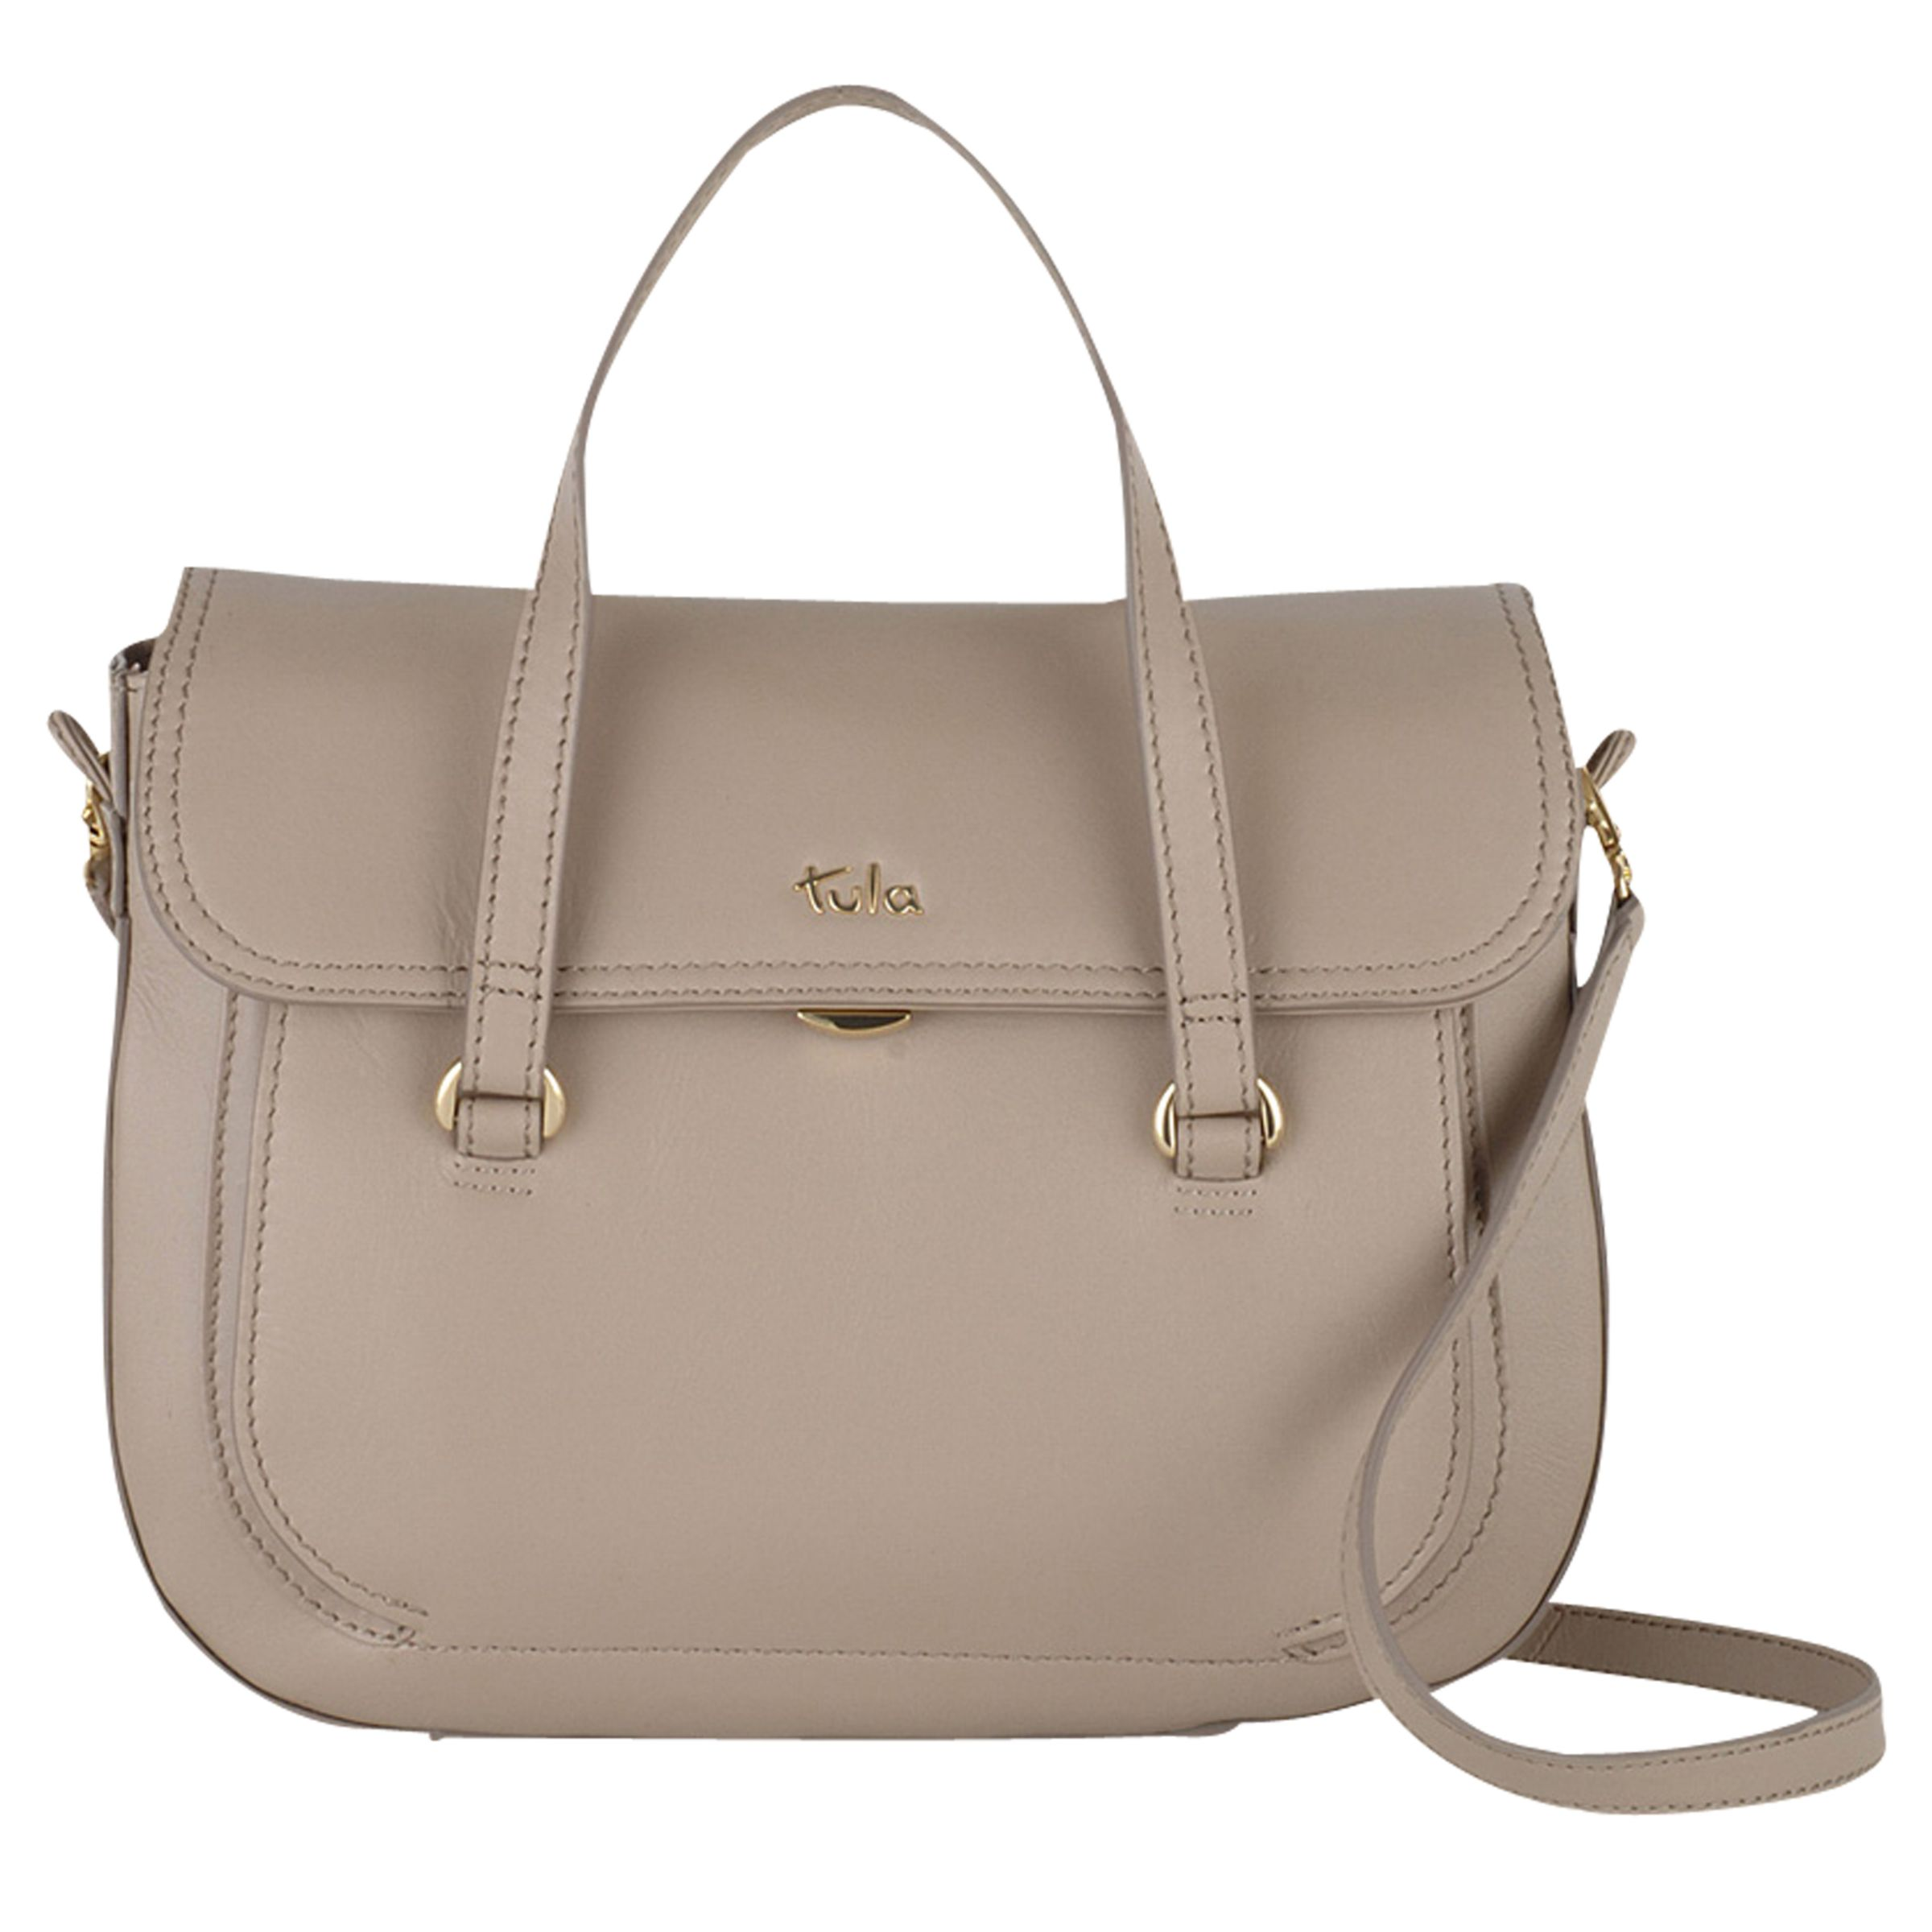 Tula Tula Bella Leather Medium Grab Bag